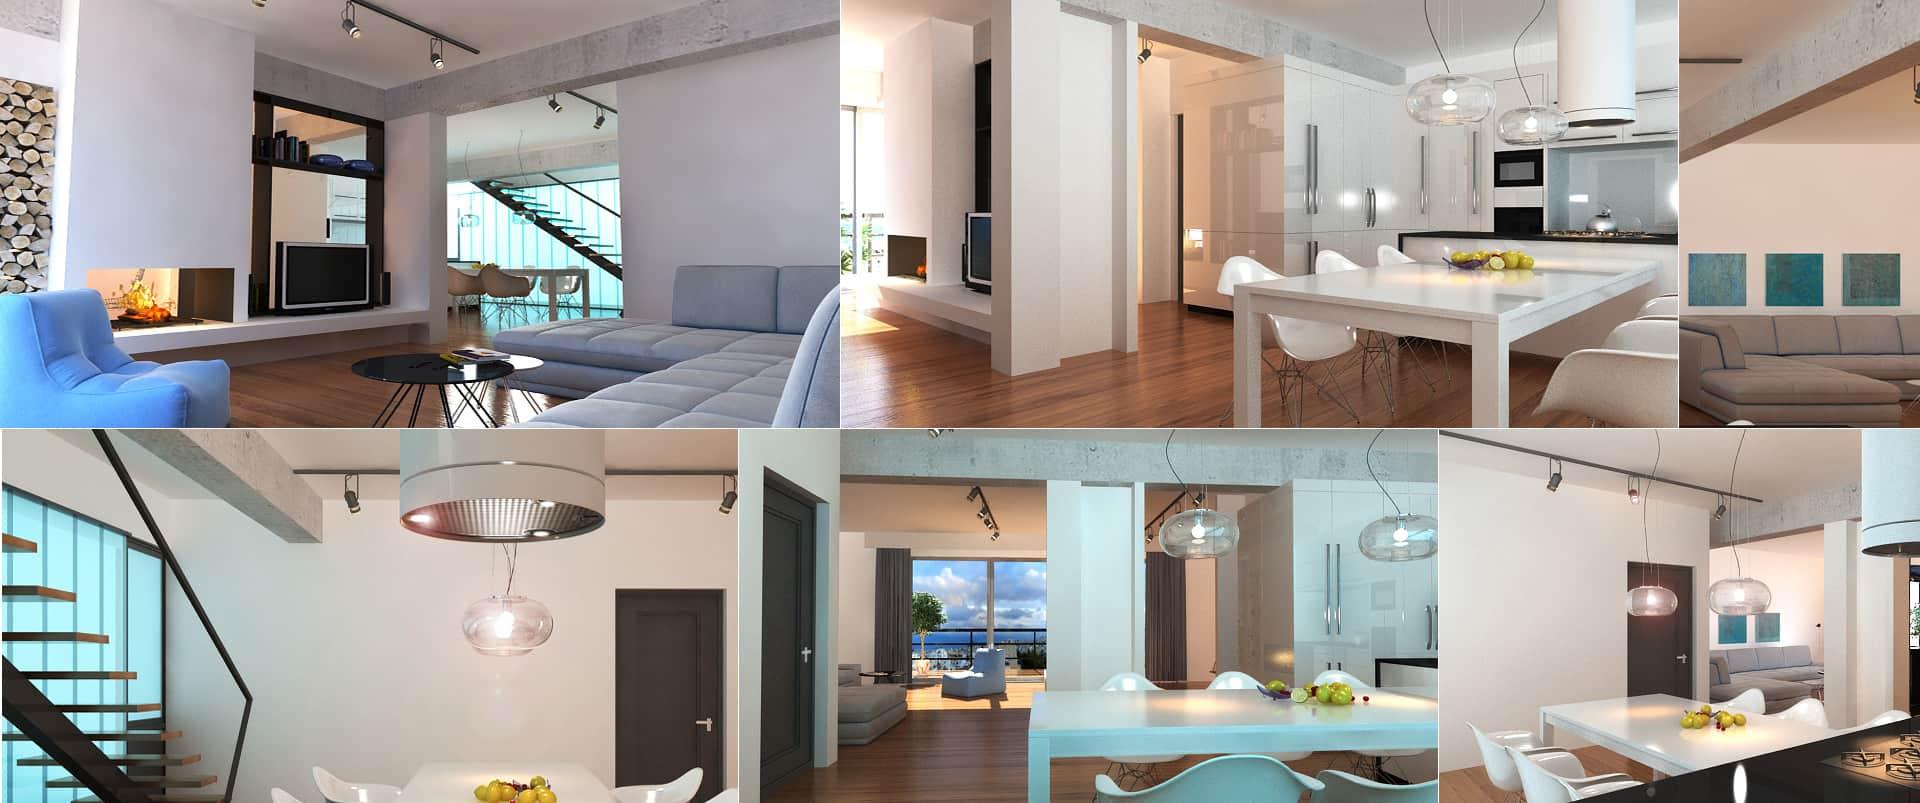 3d interior house greece